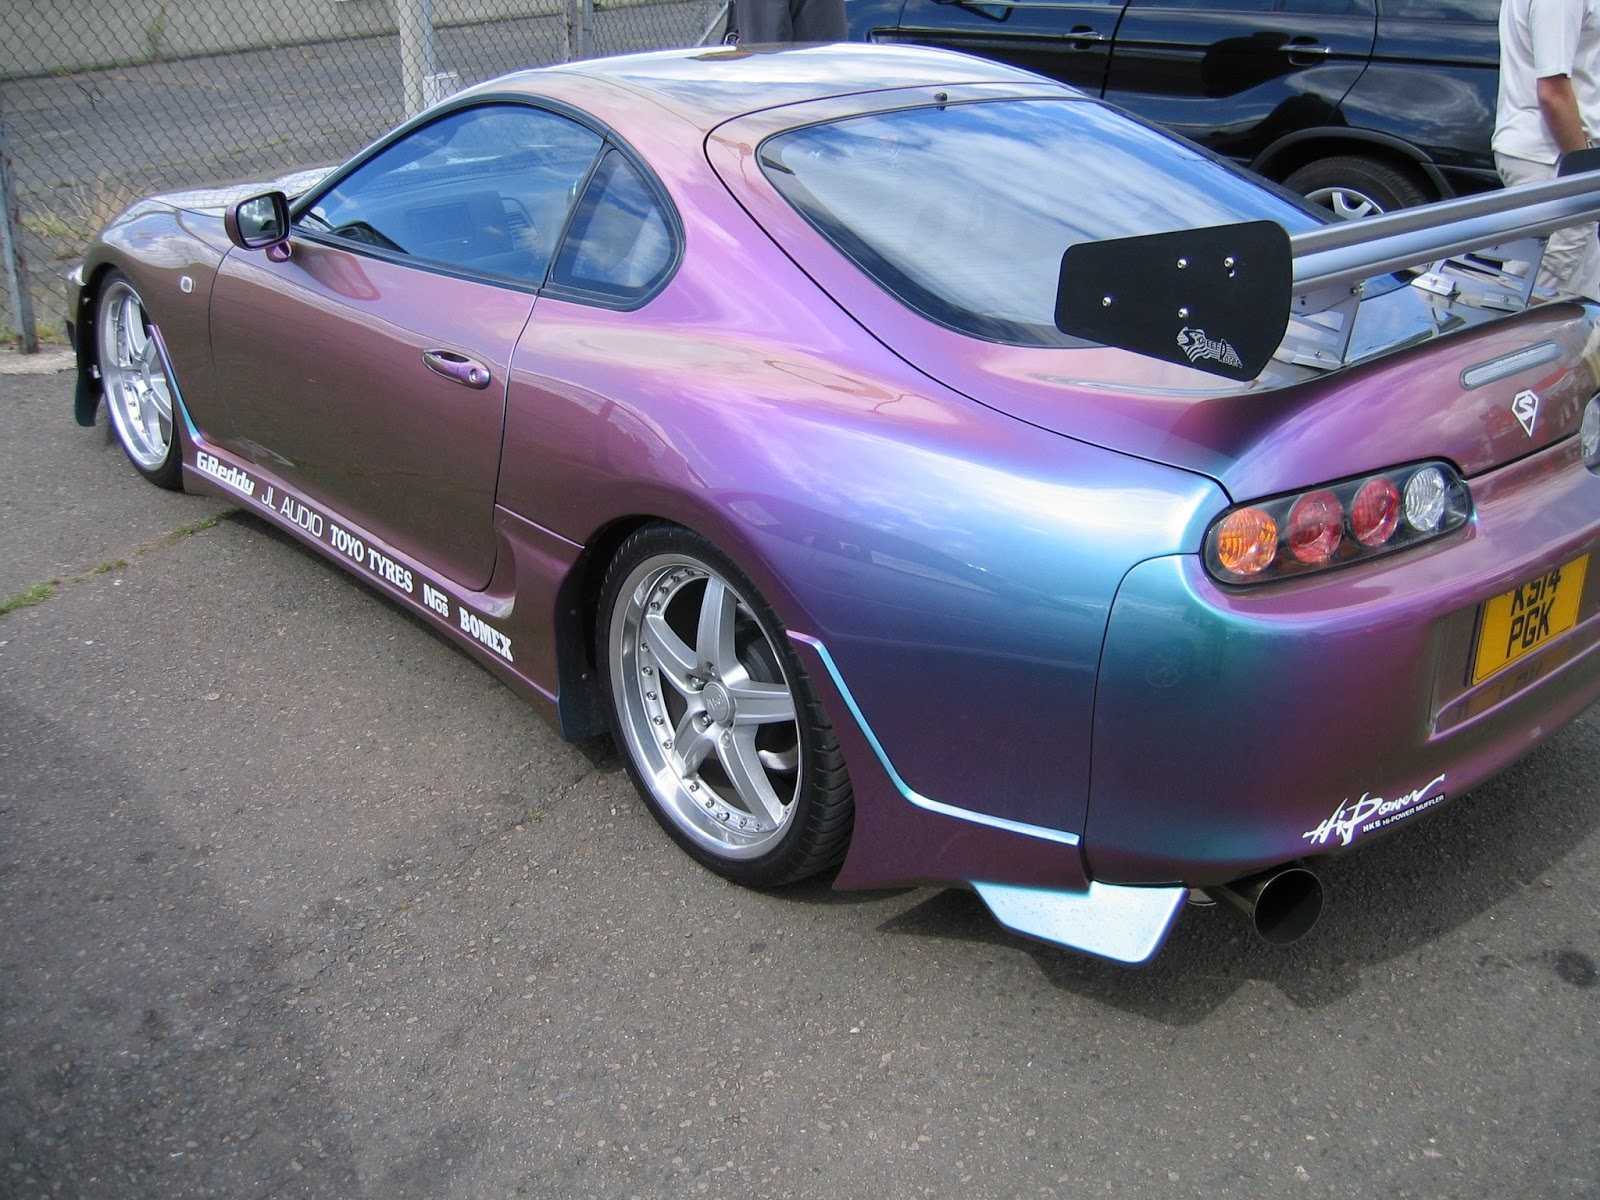 Hd Cars Wallpapers Toyota Supra